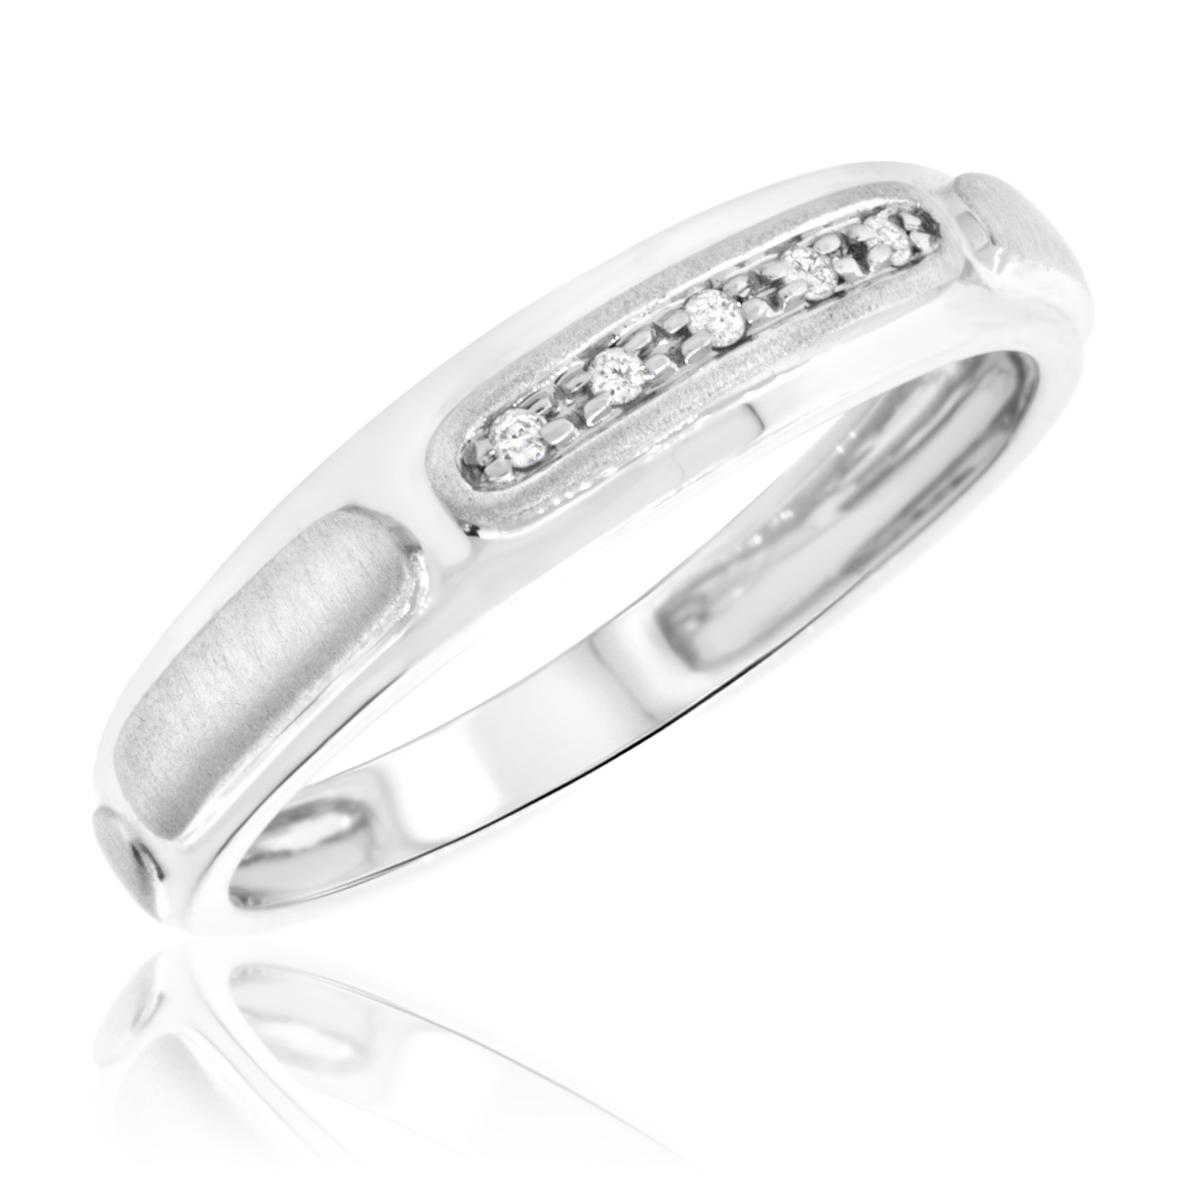 1/25 Carat T.W. Round Cut Diamond Ladies Wedding Band 14K White Gold- Size 8